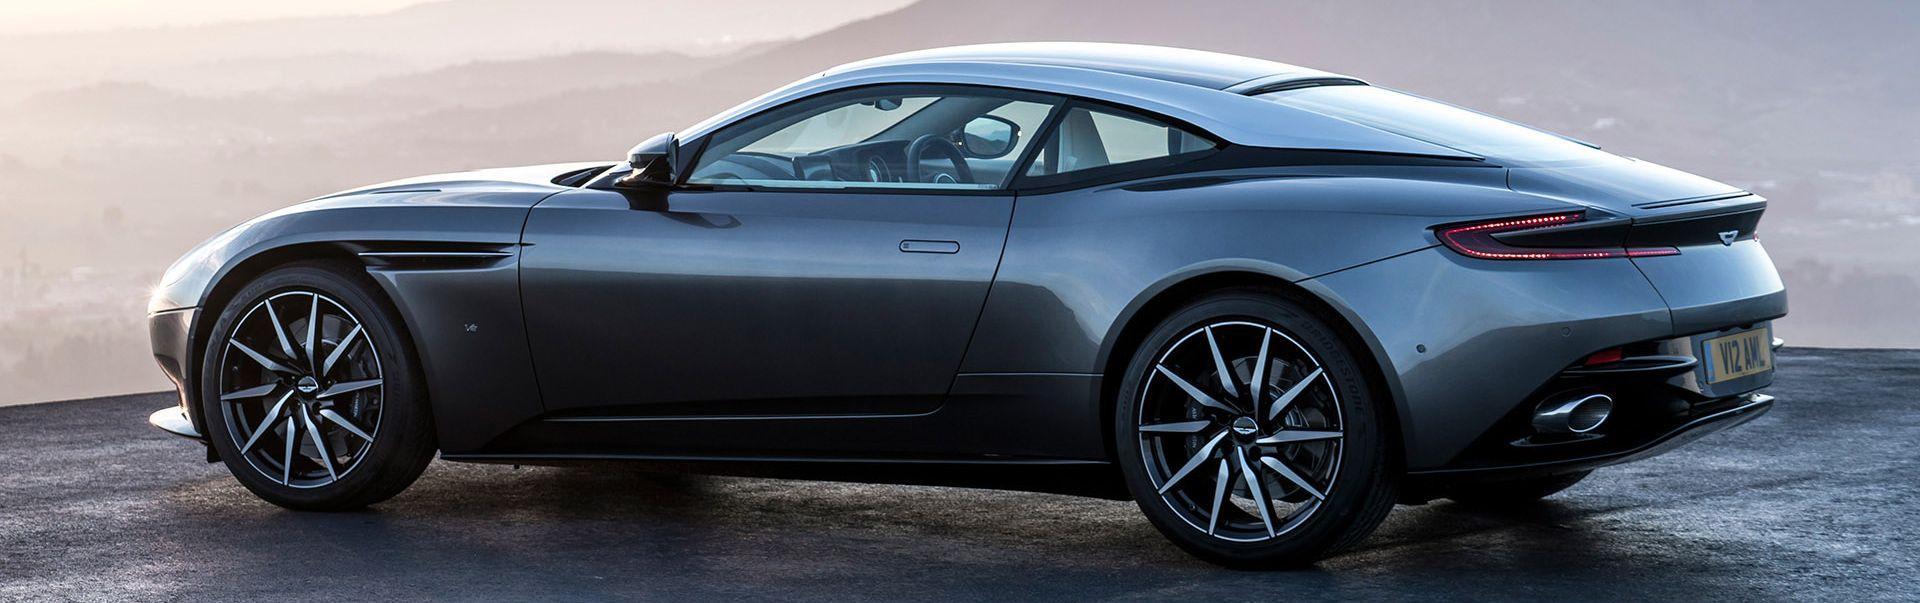 2018 Aston Martin Db11 Financing In Austin Tx Aston Martin Of Austin